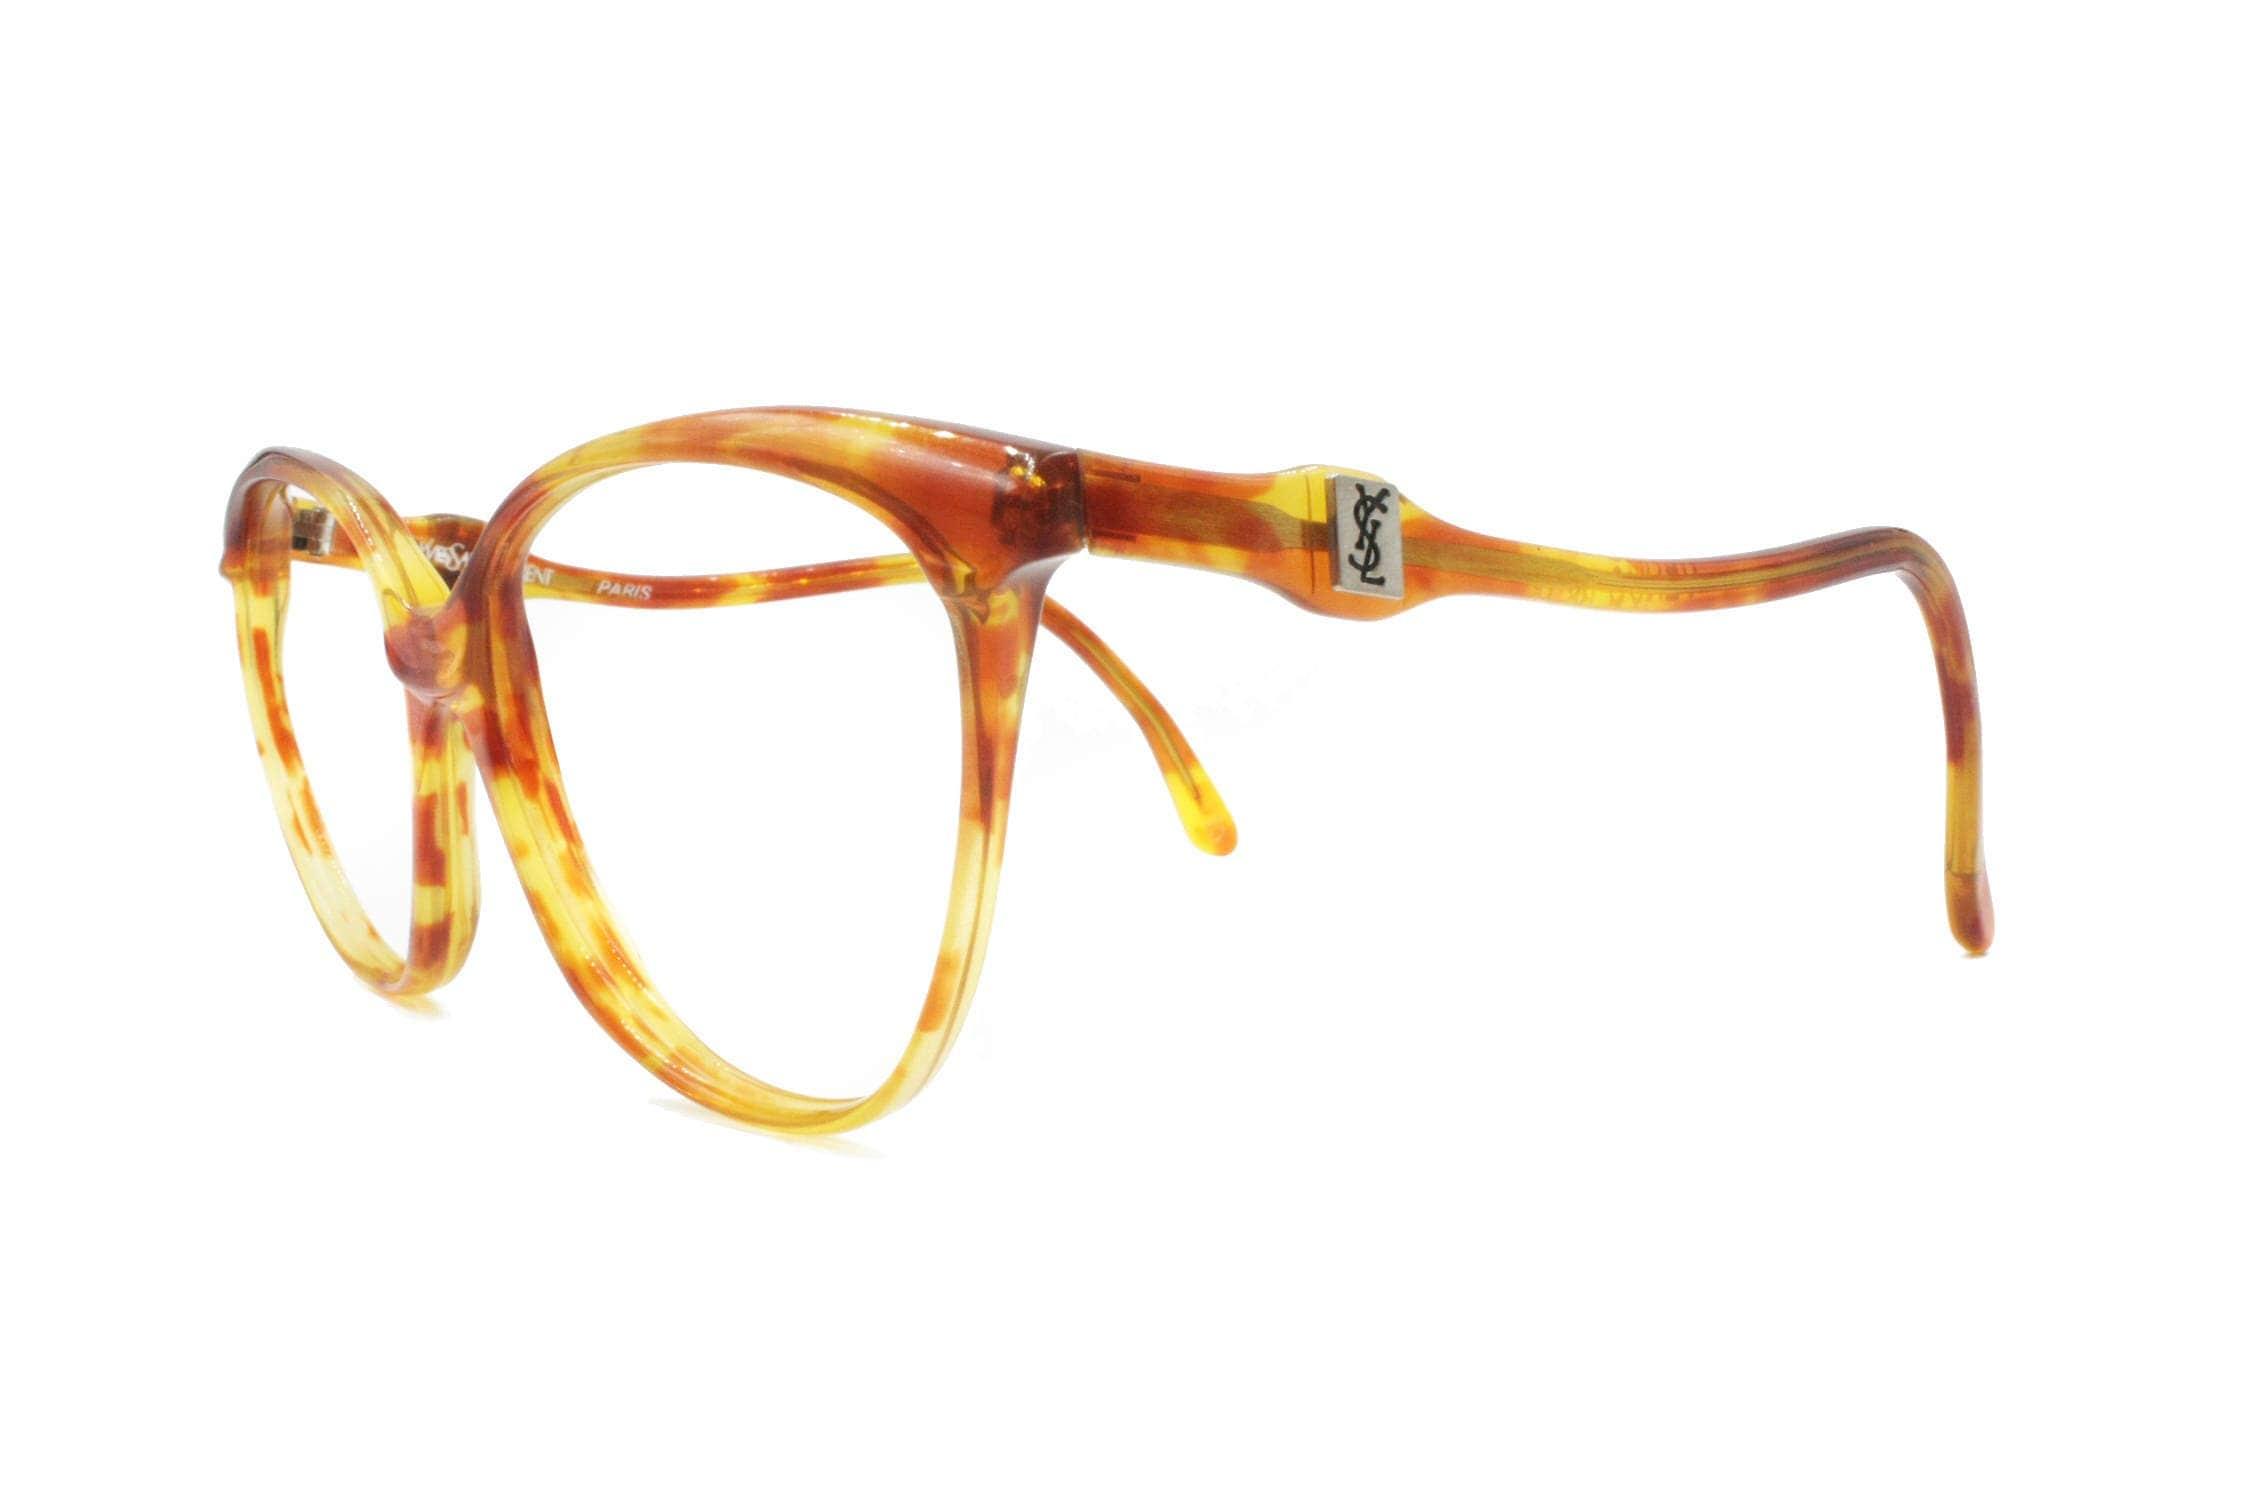 07476472b3 Yves saint Laurent YSL vintage acetate glasses frame blondie e brown caramel     half lunettes